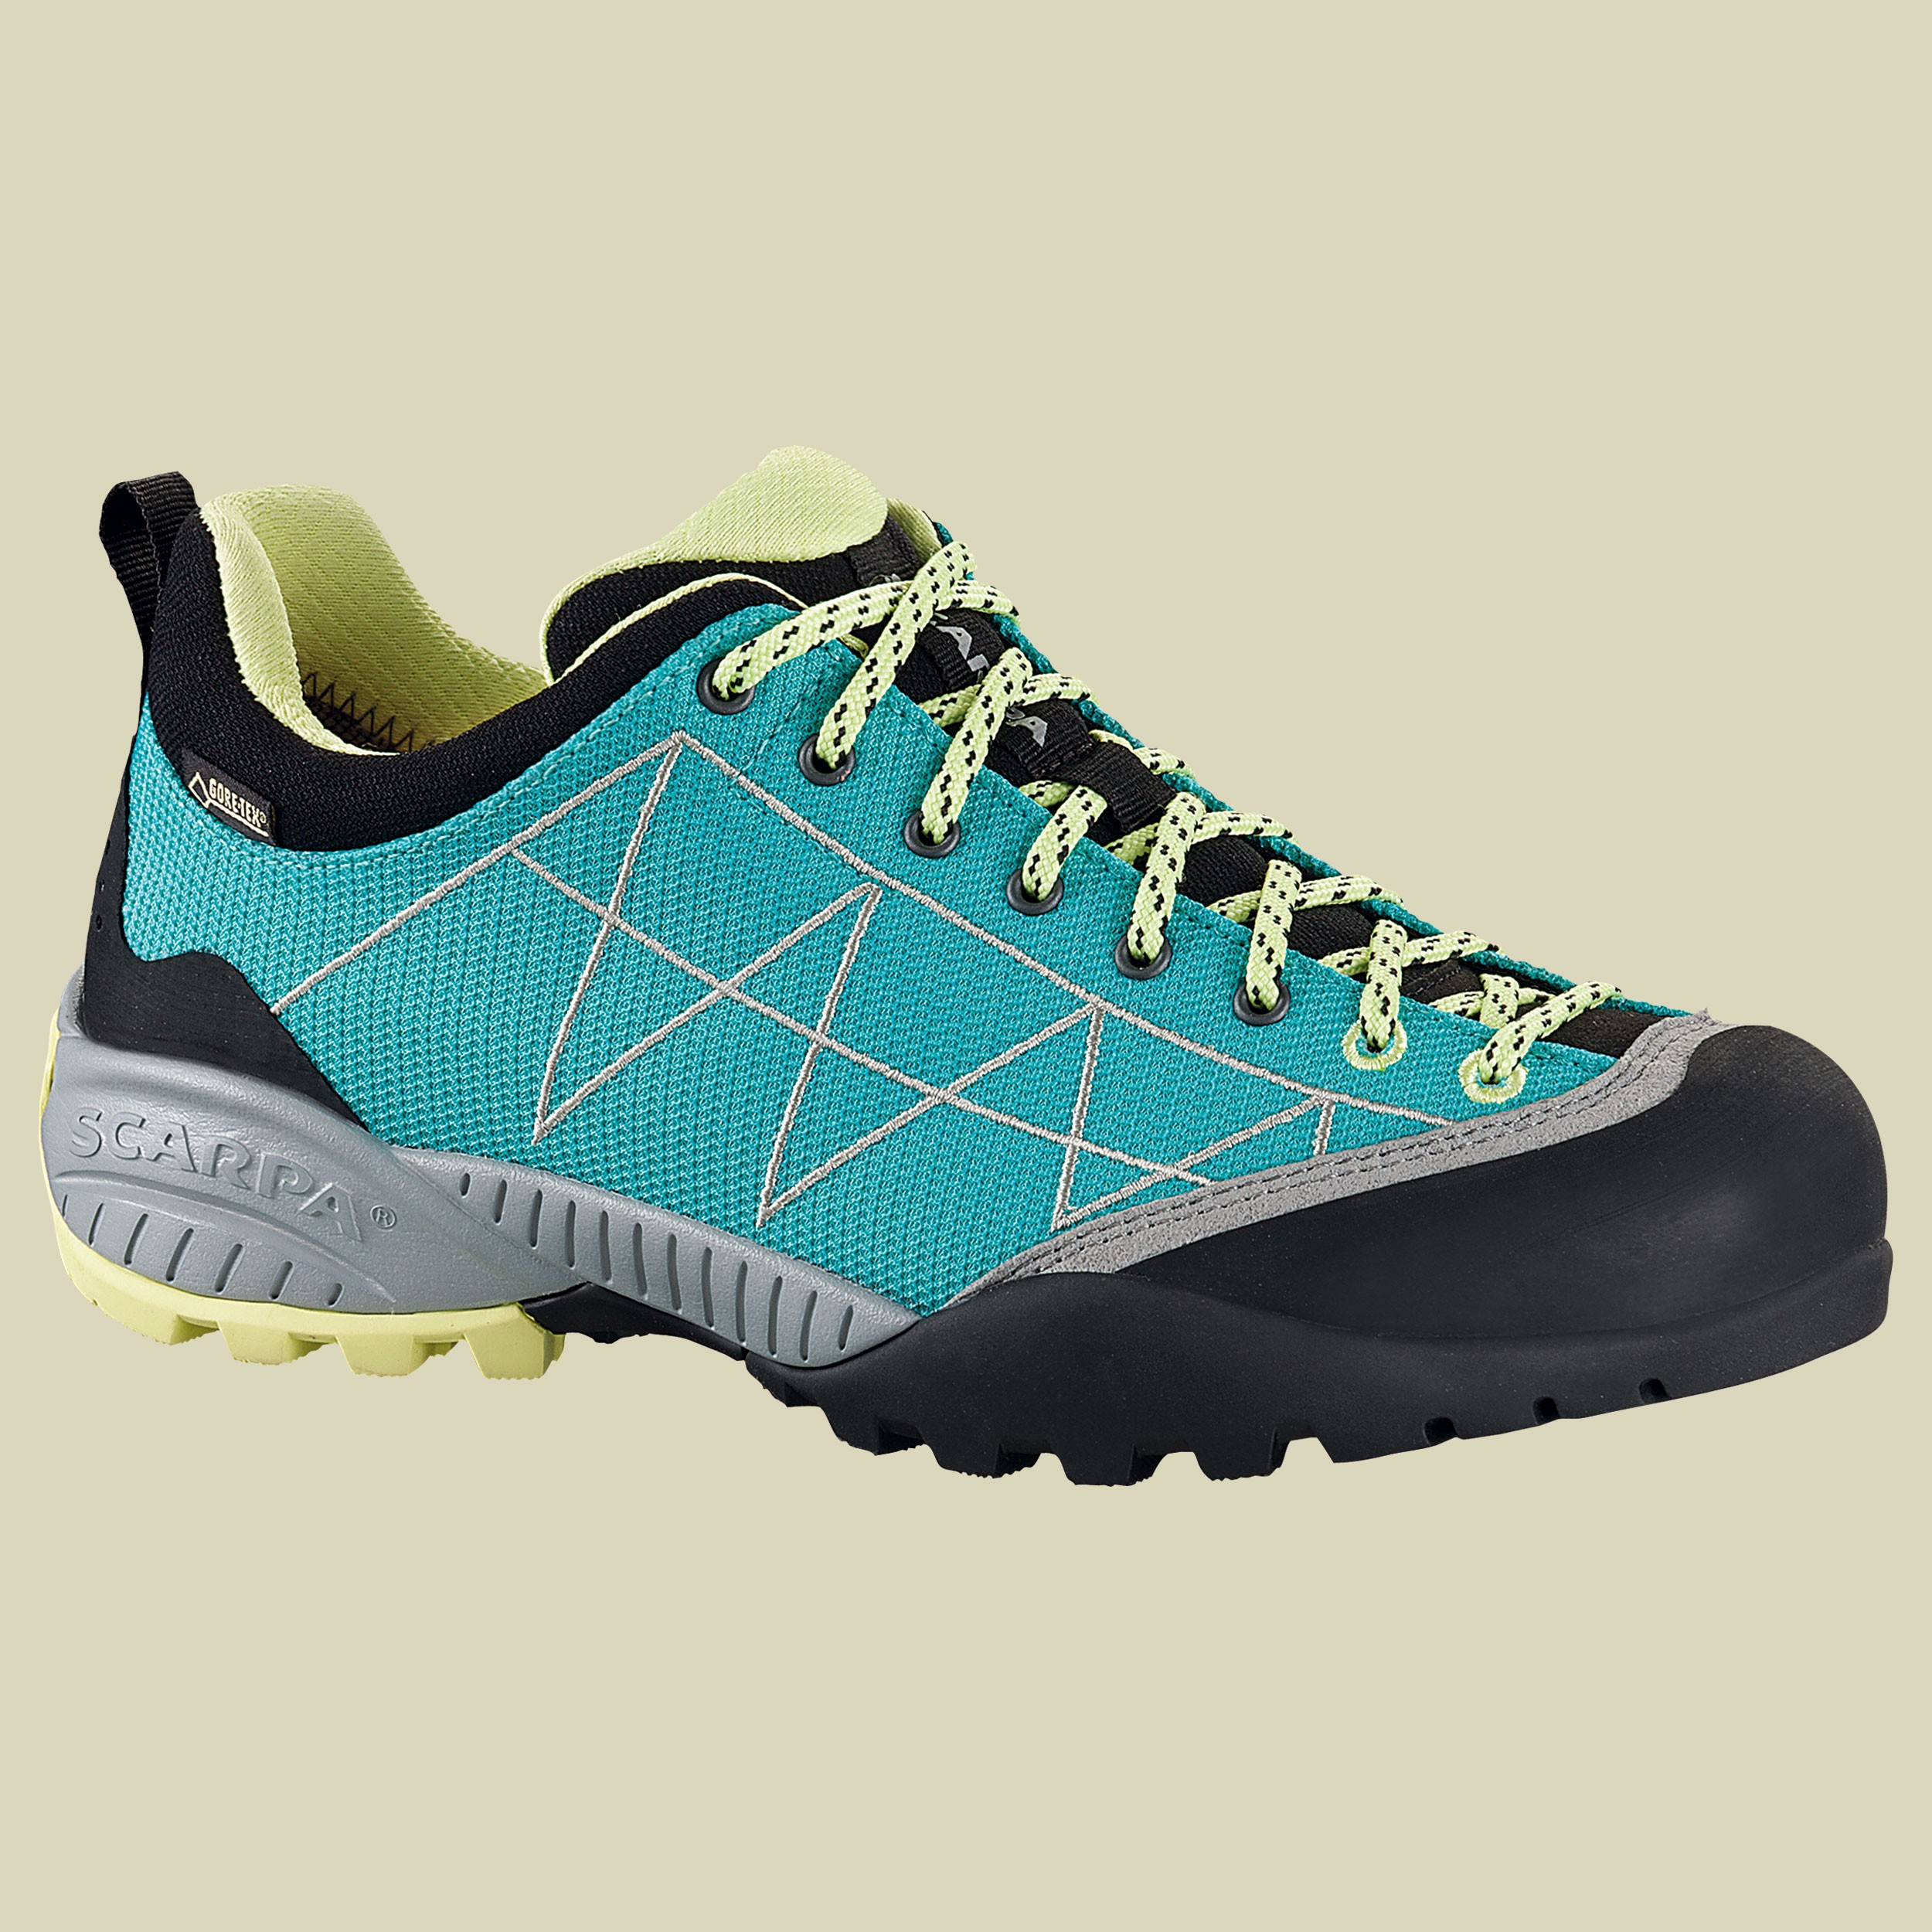 Scarpa Schuhe Zen Lite GTX Women Damen Zustiegsschuh